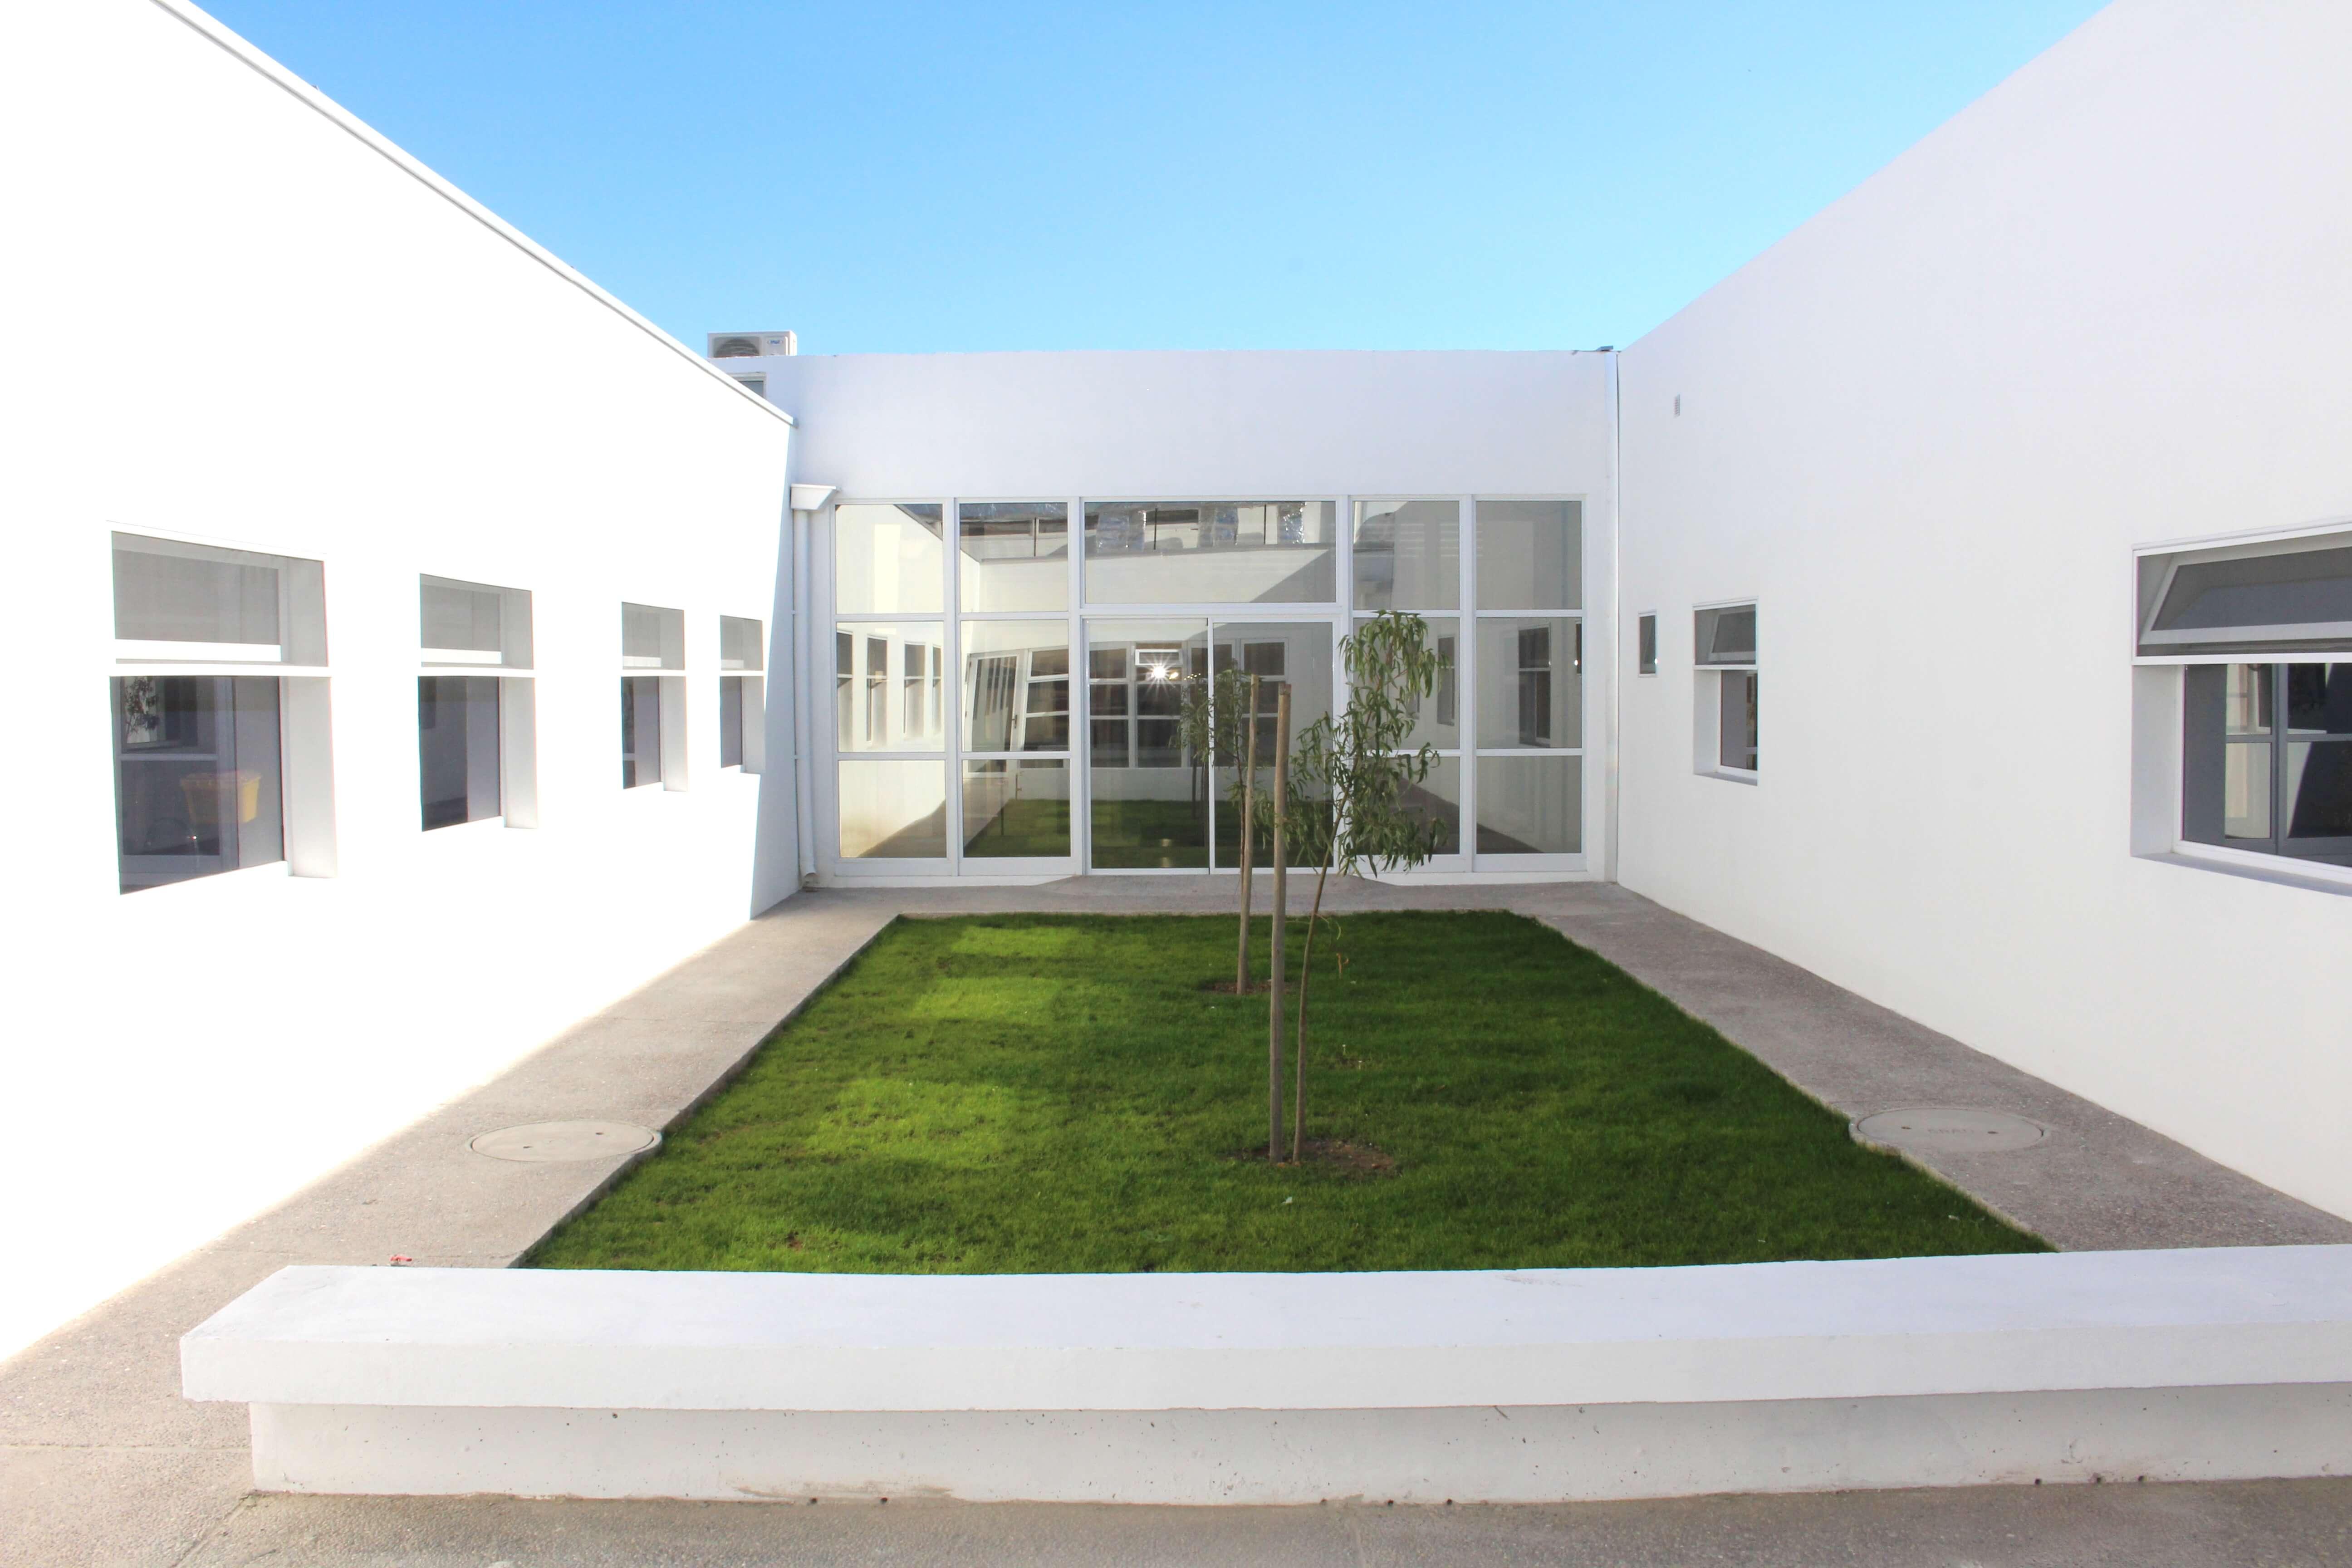 Obra-Terminada-Cesfam-El-Sauce-Coquimbo-Constructora-Rencoret-2